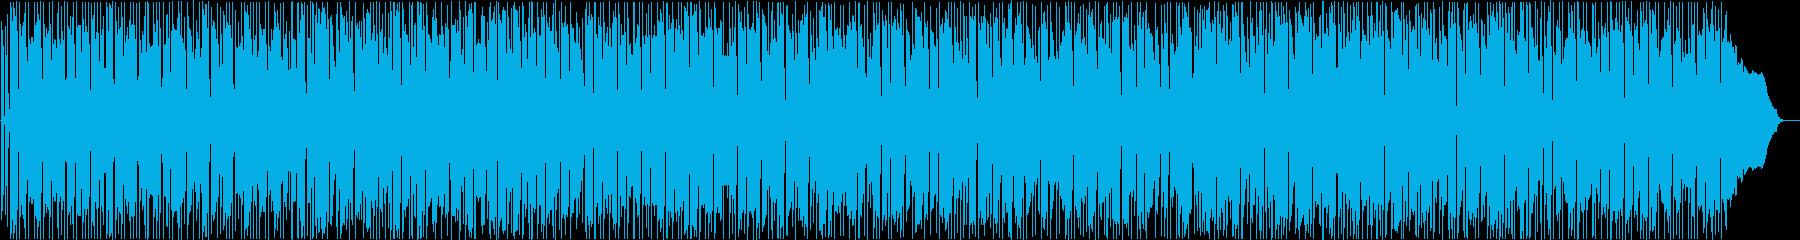 LOST PLANETの再生済みの波形